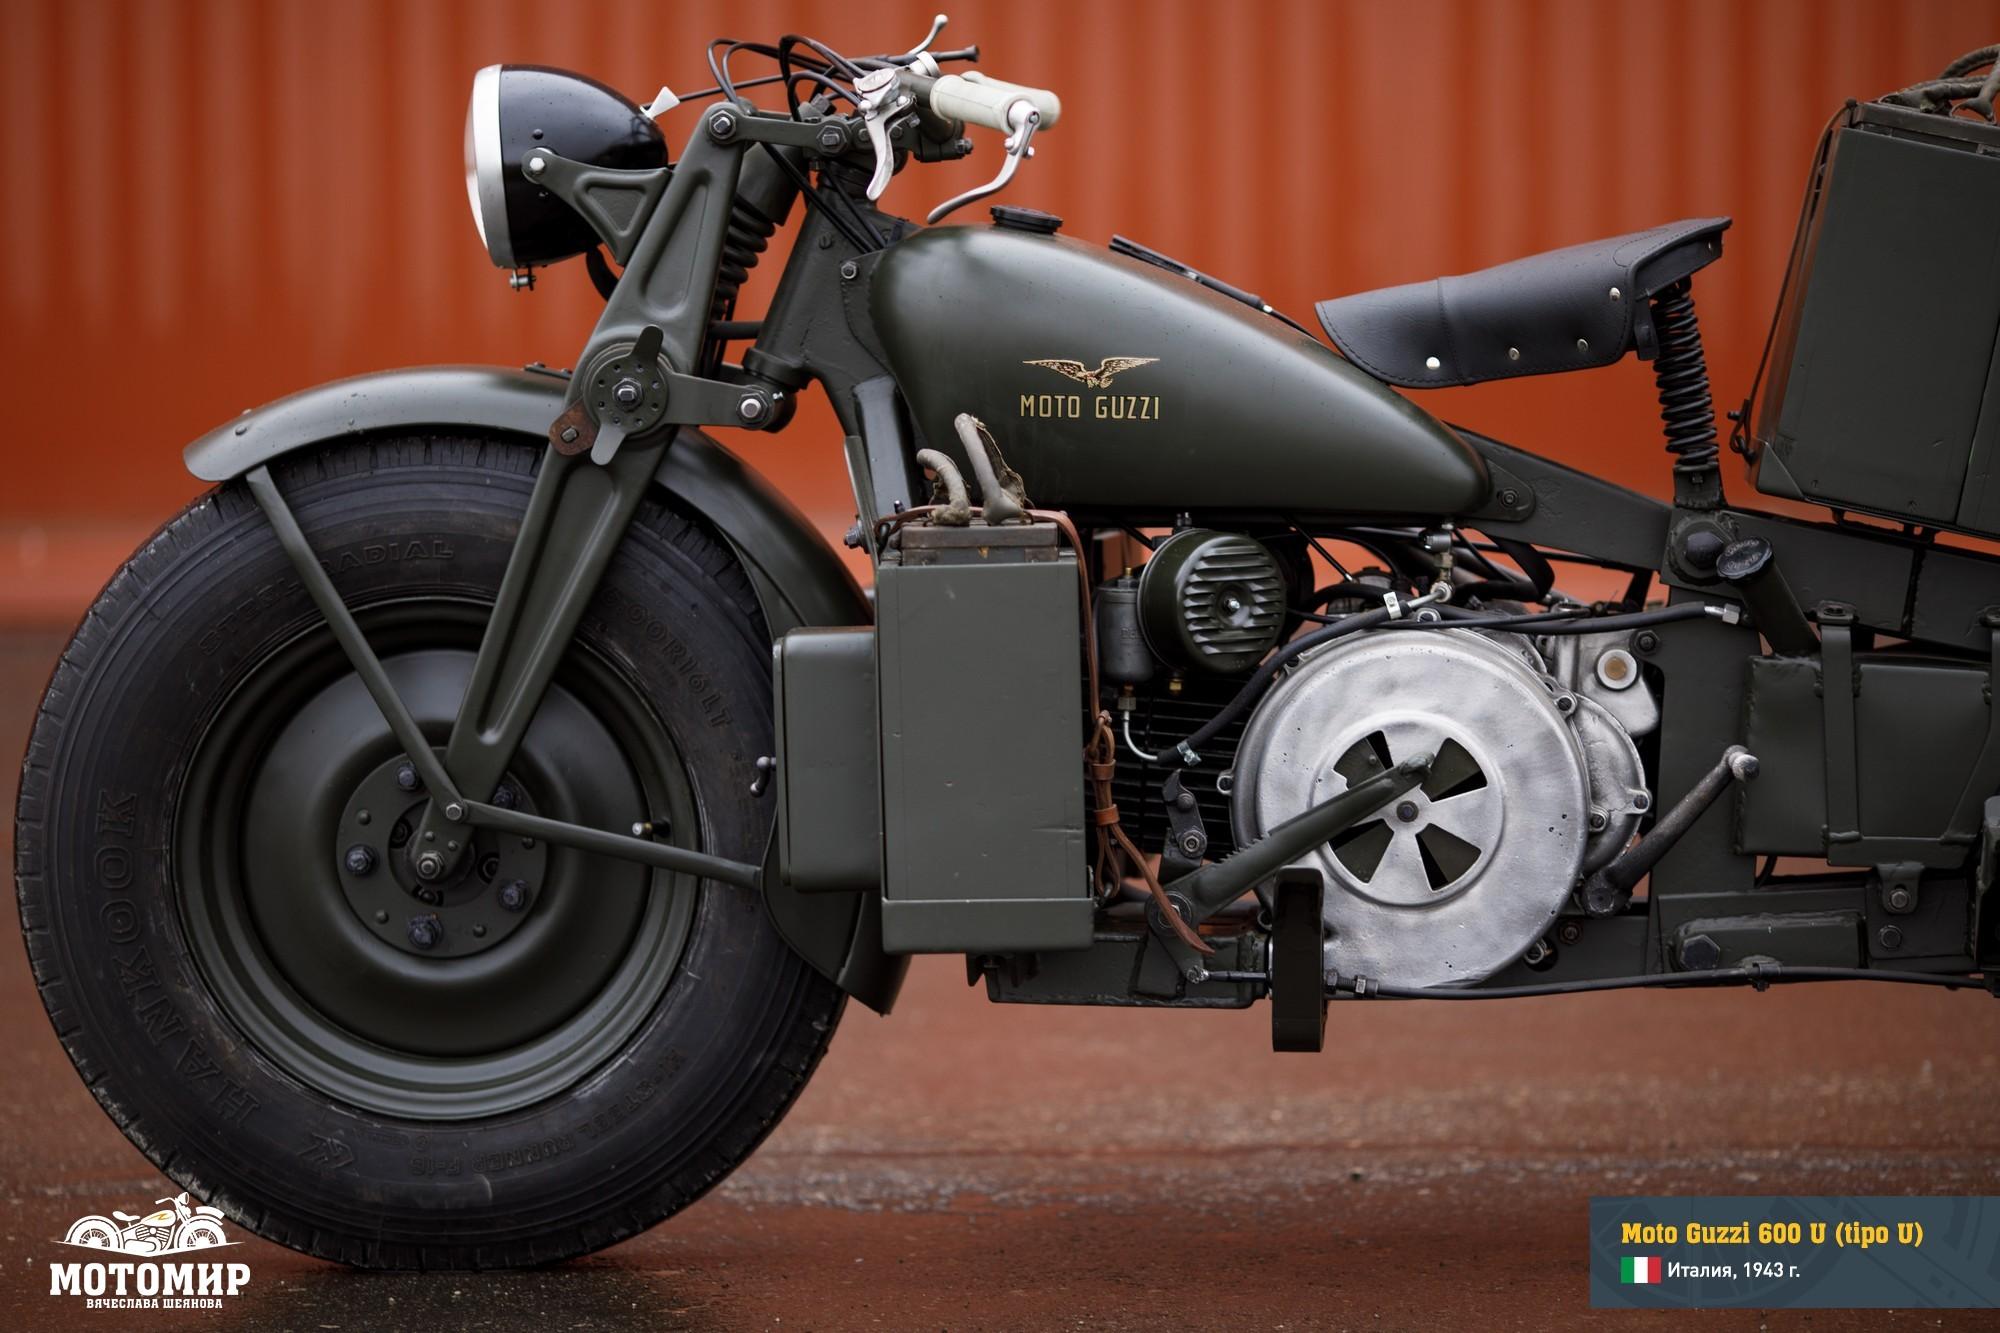 moto-guzzi-600-u-web-11